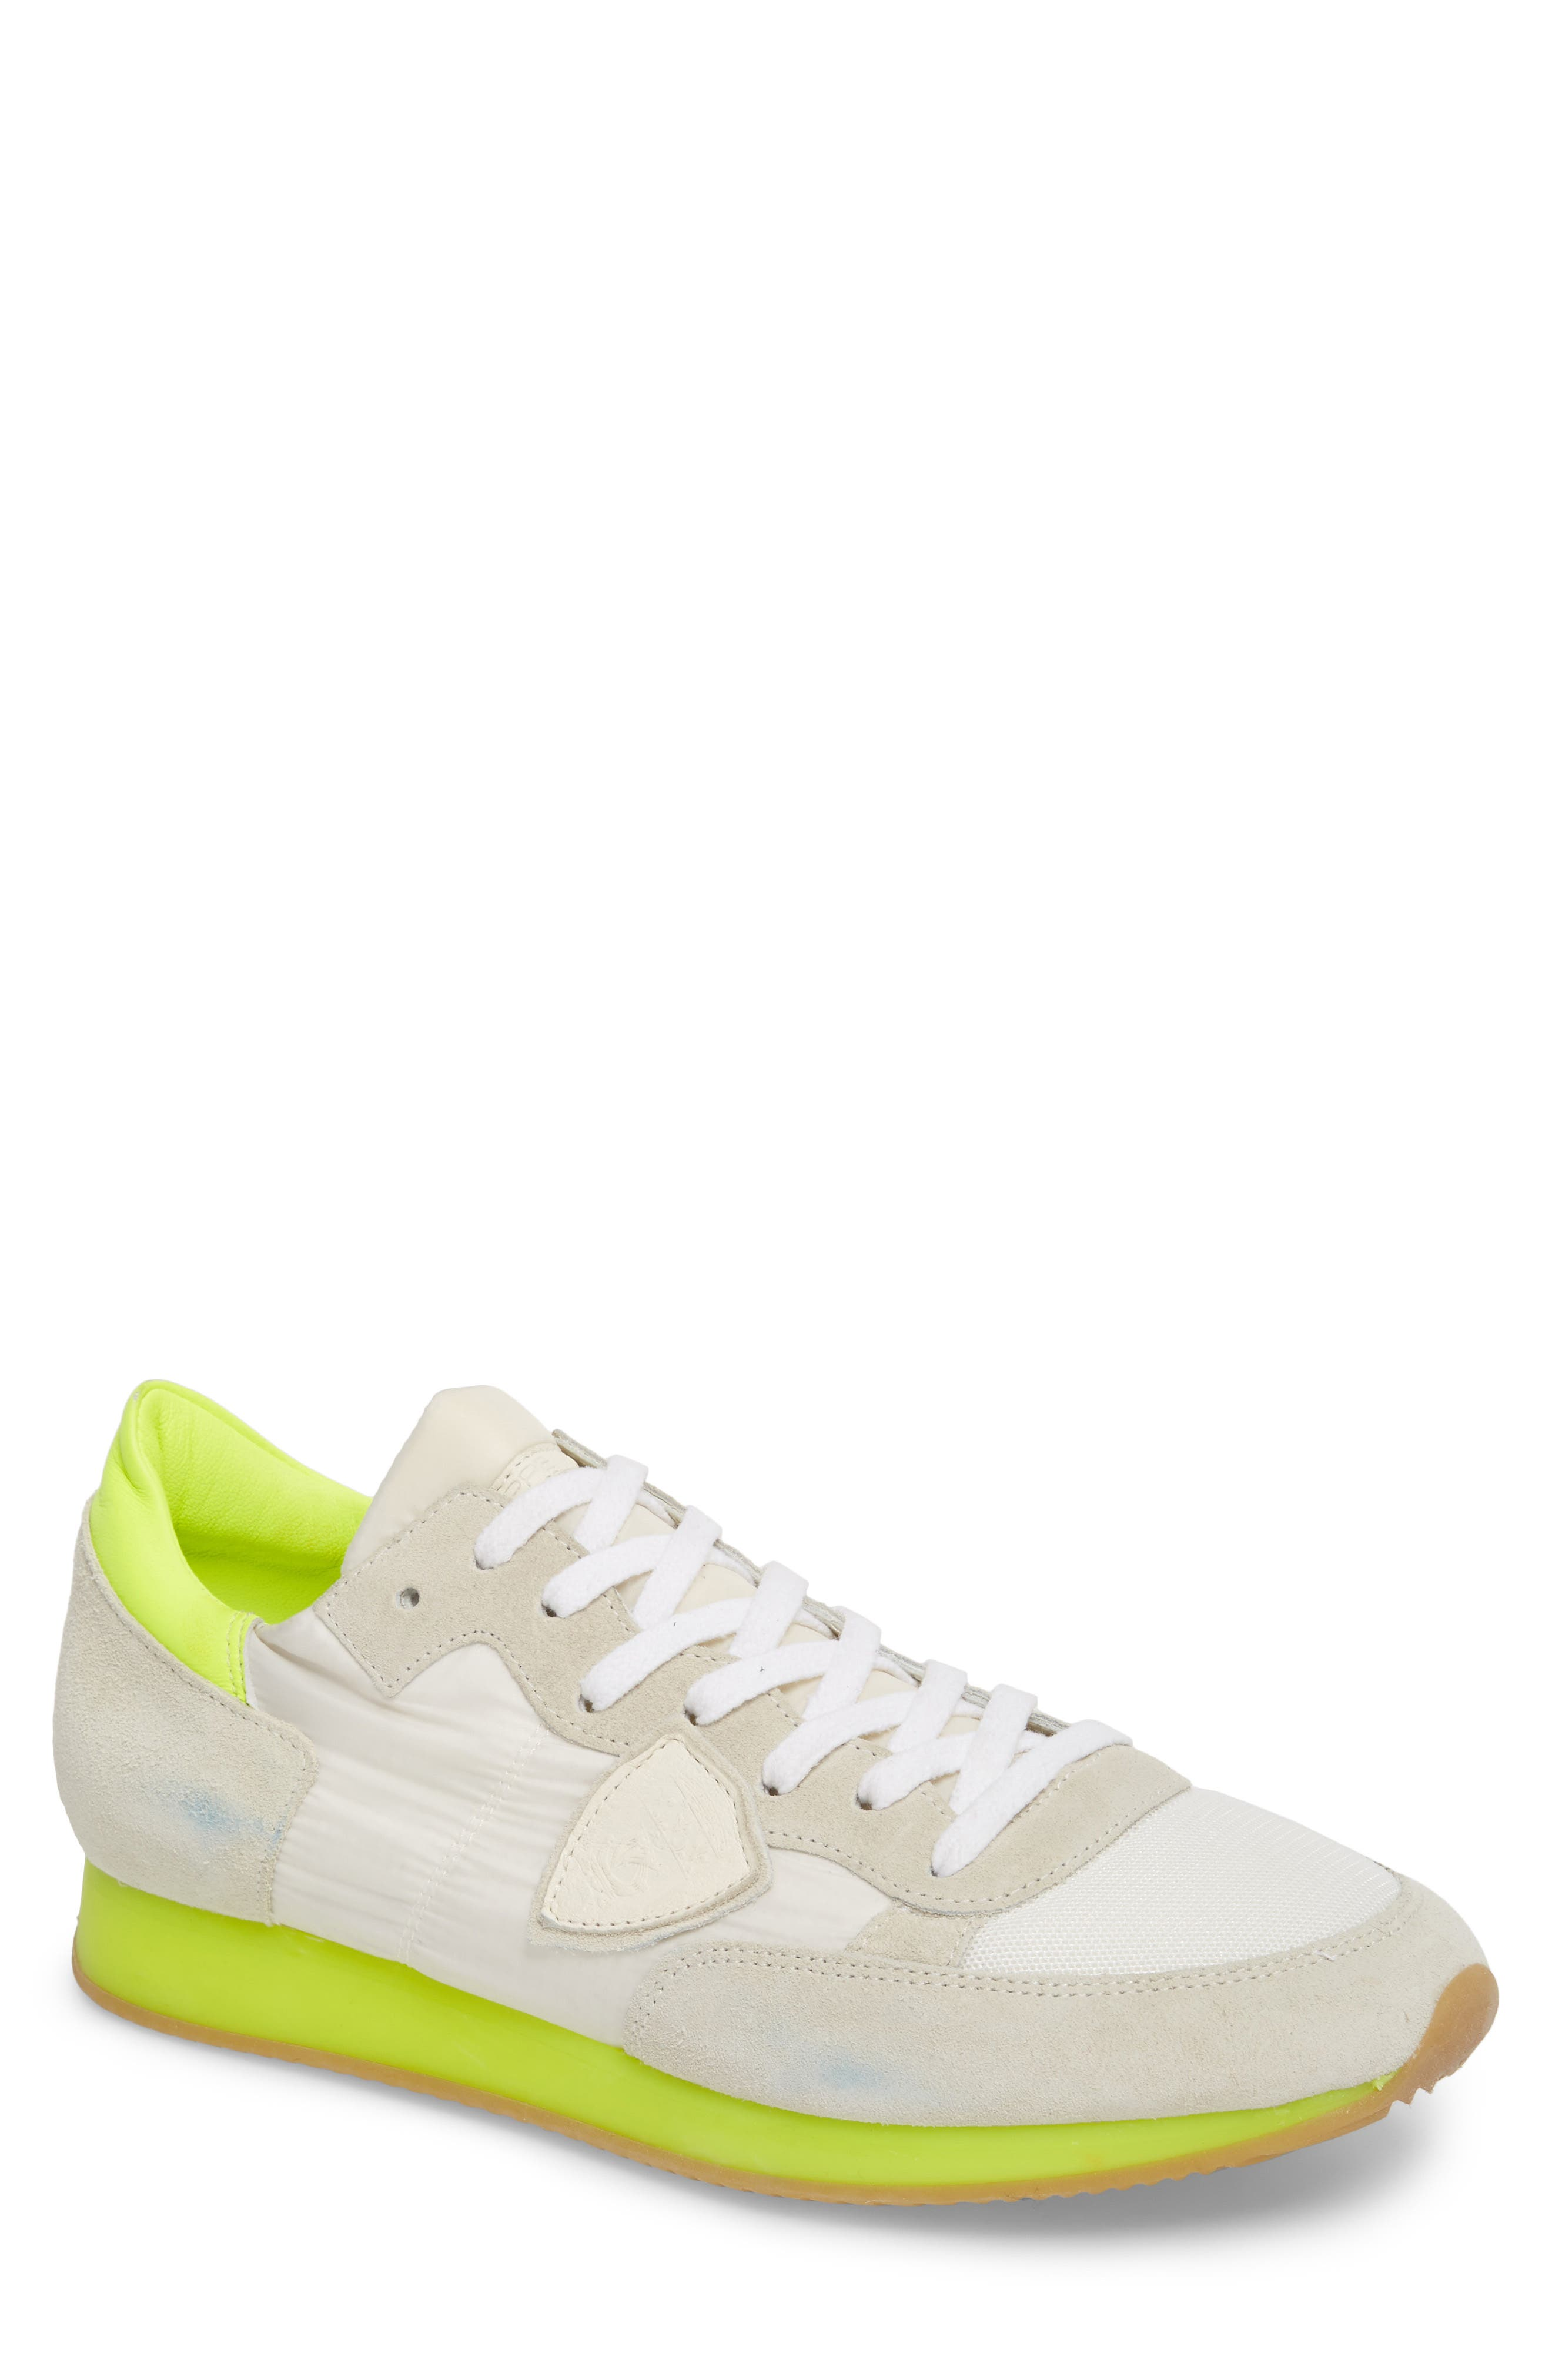 Main Image - Philippe Model Tropez Low Top Sneaker (Men)